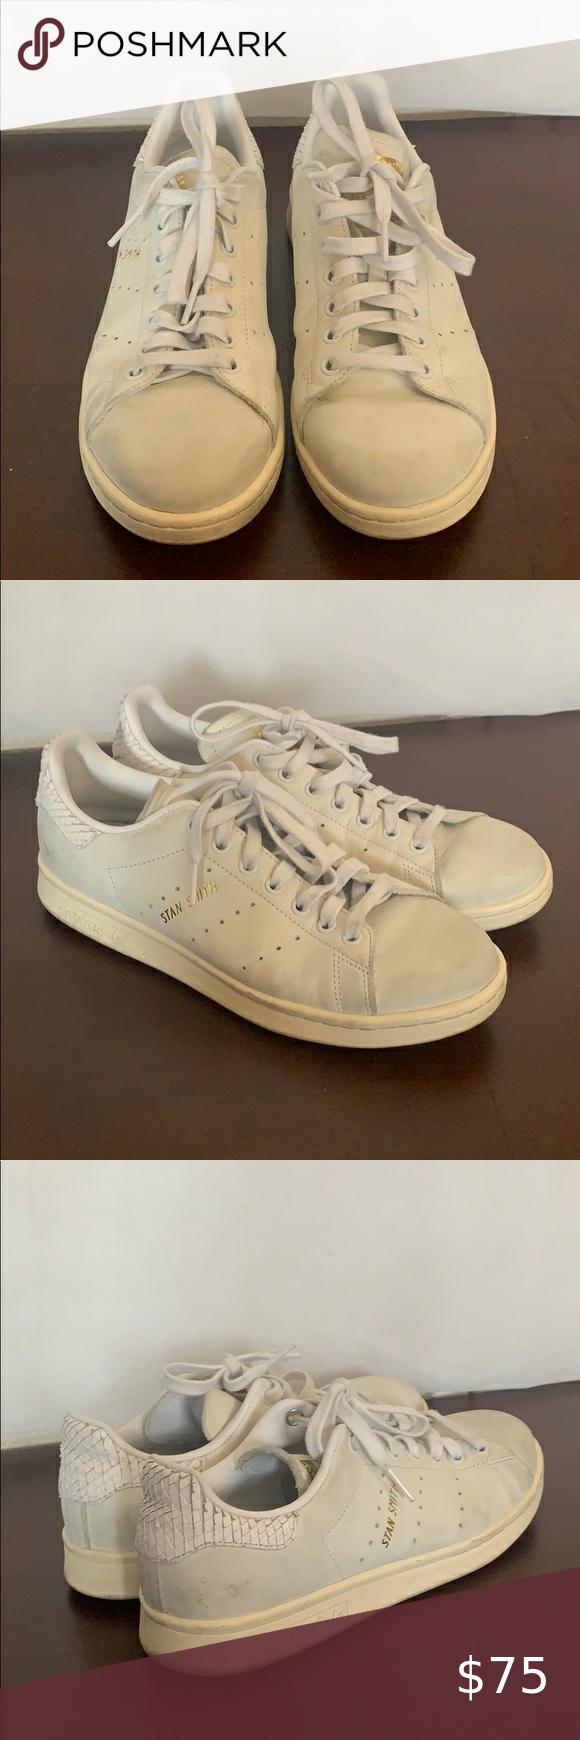 Adidas Original Stan Smith Women Shoes